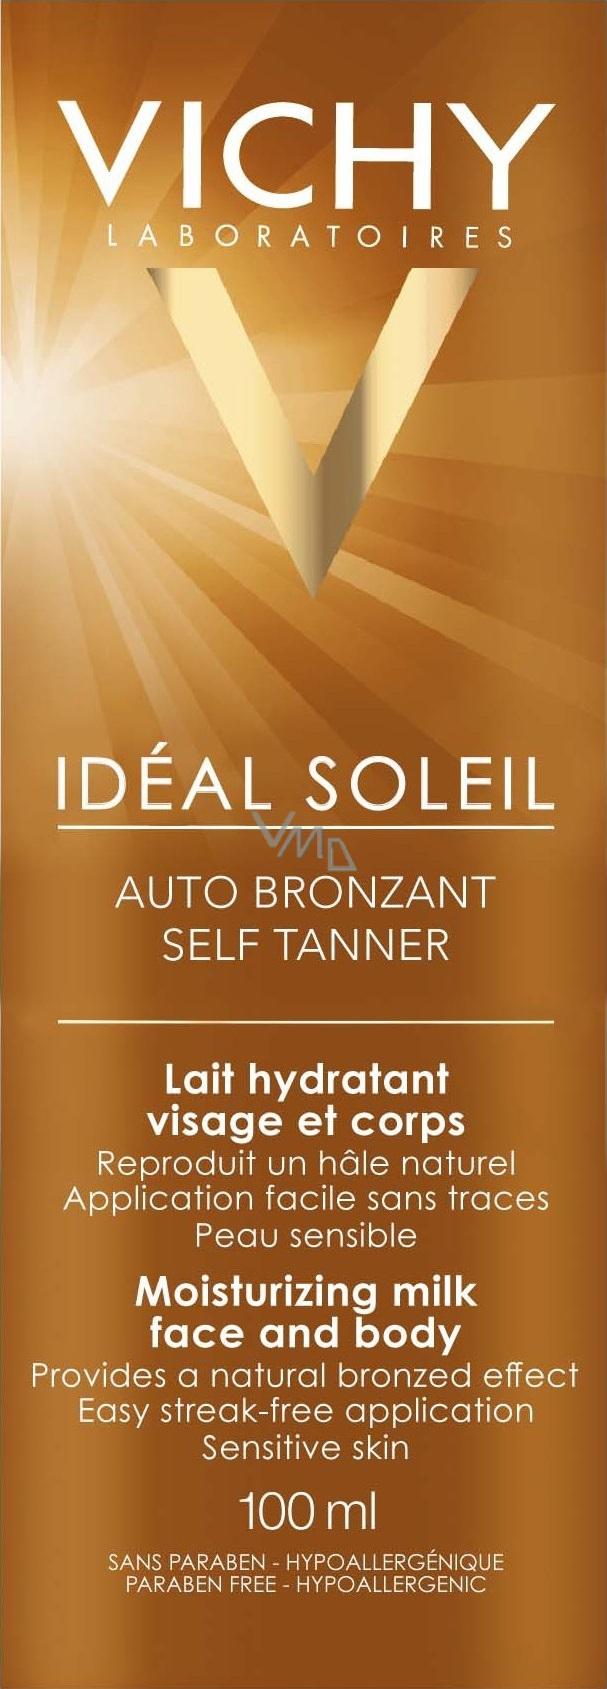 vichy ideal soleil auto bronzant hydrata n samoopalovac ml ko na obli ej a t lo 100 ml vmd. Black Bedroom Furniture Sets. Home Design Ideas